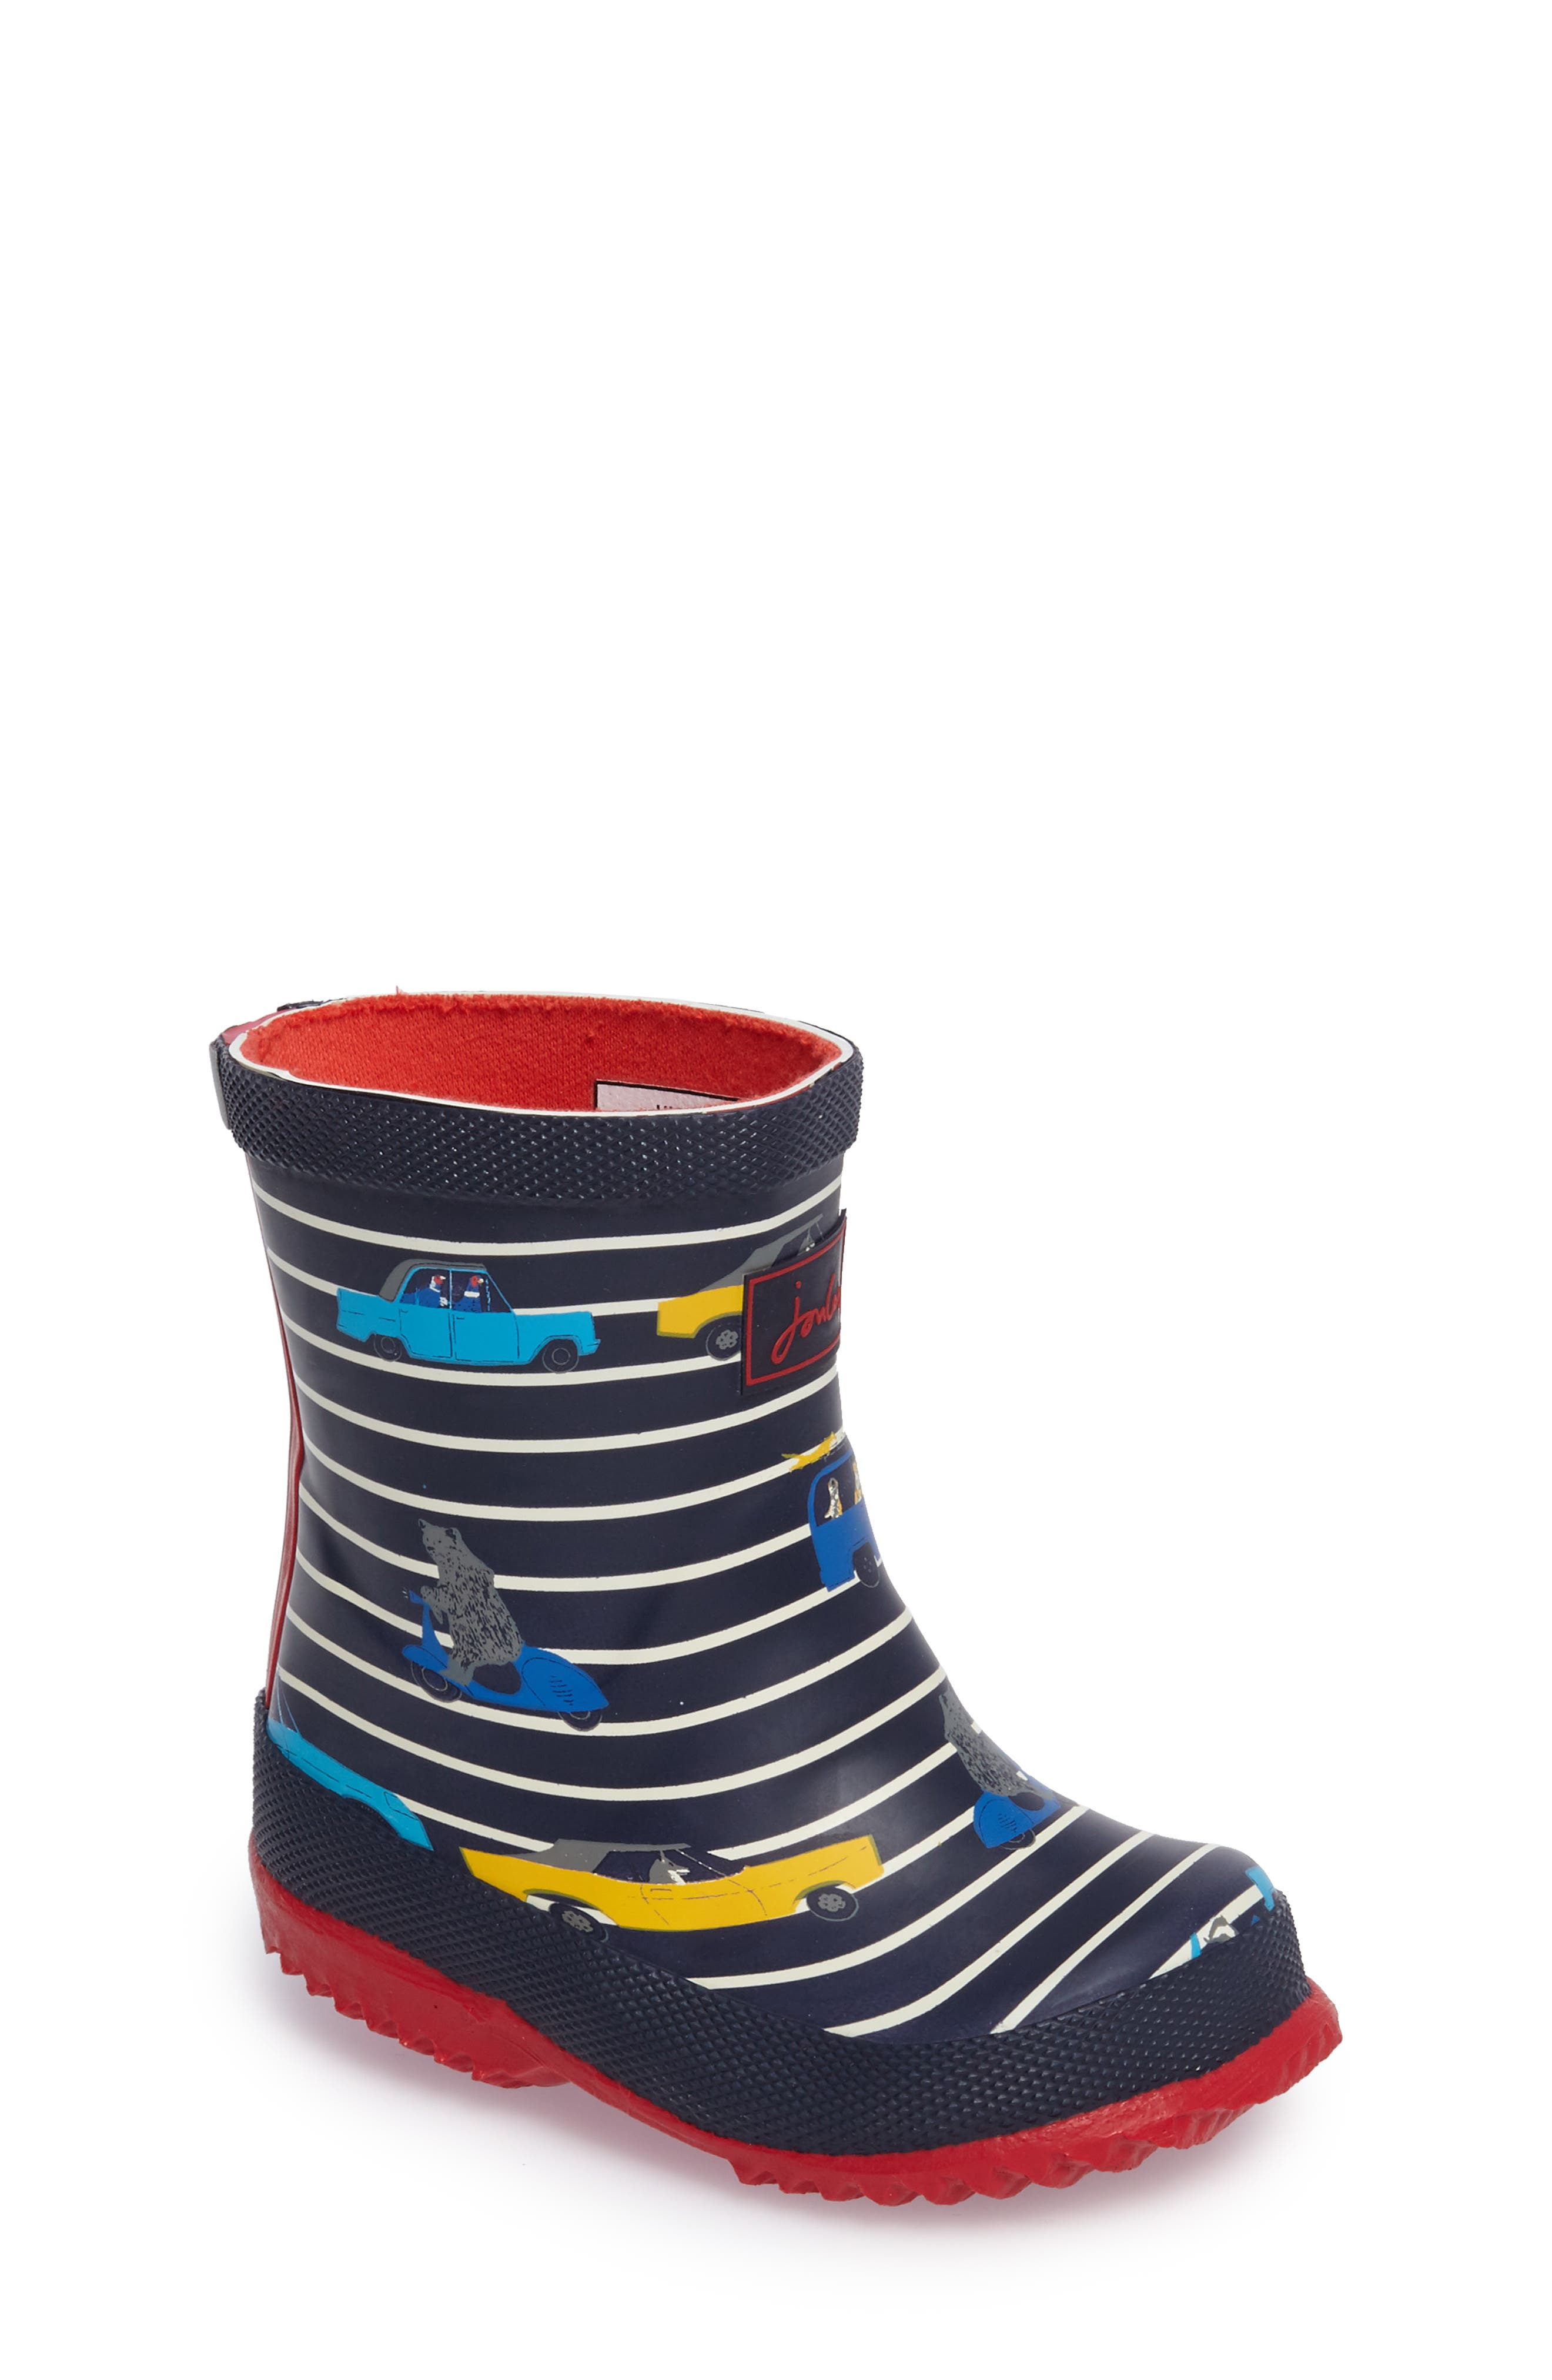 Printed Waterproof Rain Boot,                             Main thumbnail 1, color,                             Navy Car